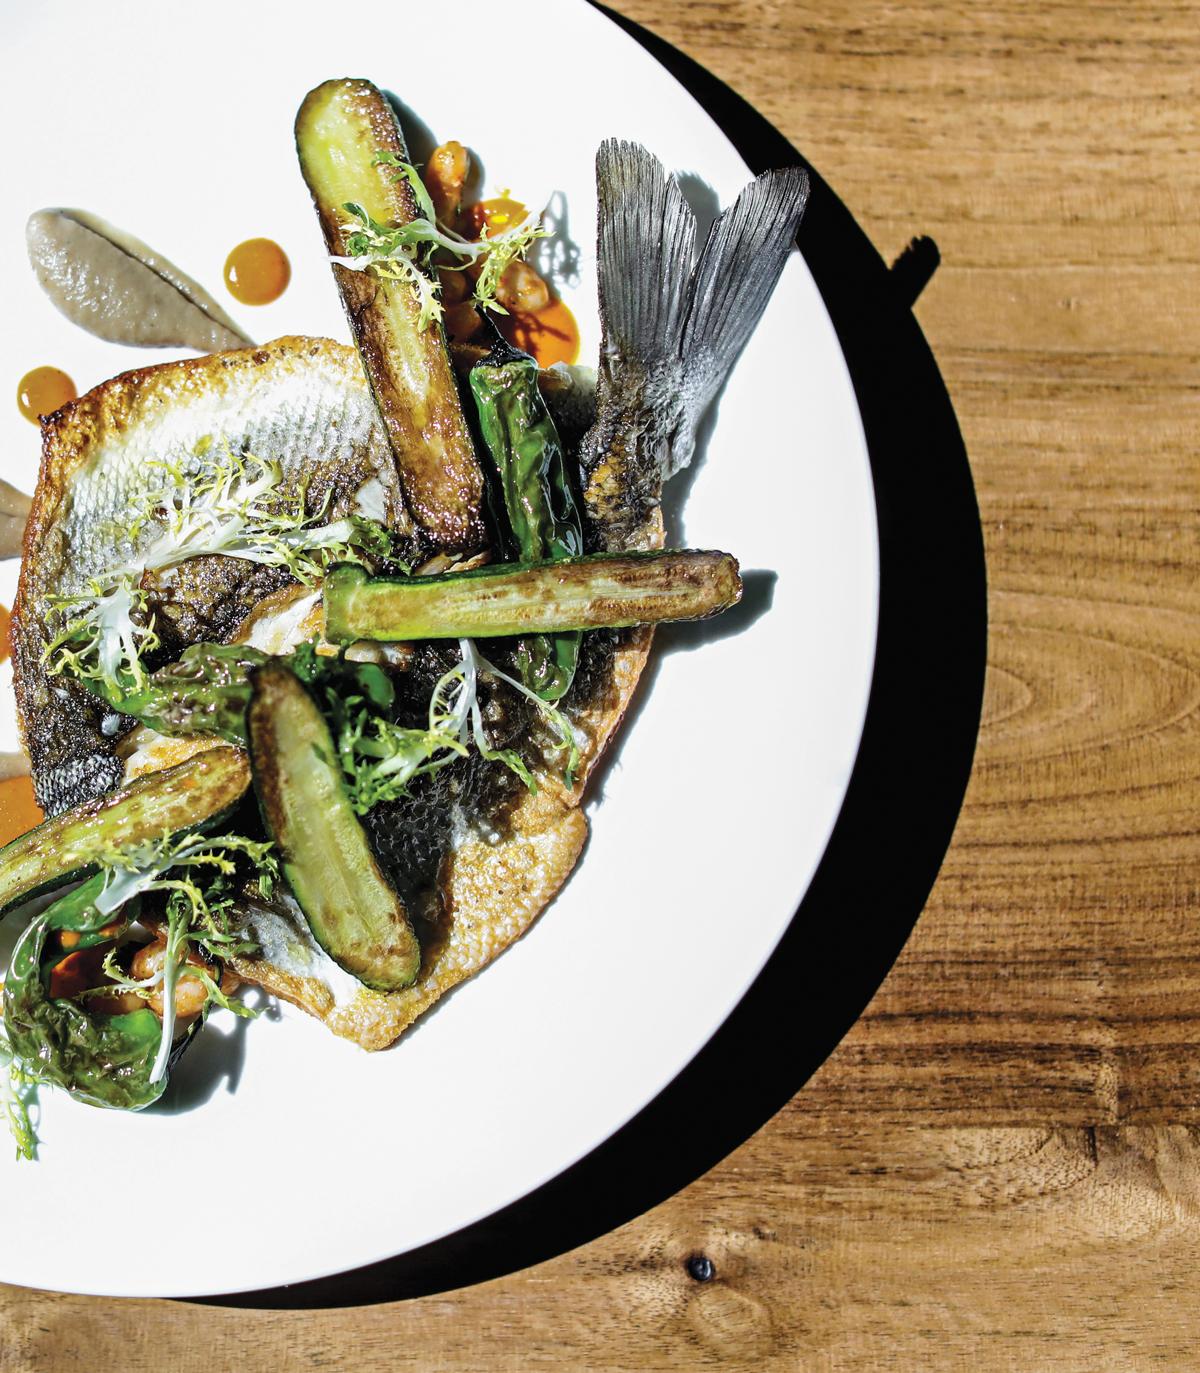 Best New Restaurants in Atlanta - Noble Fin